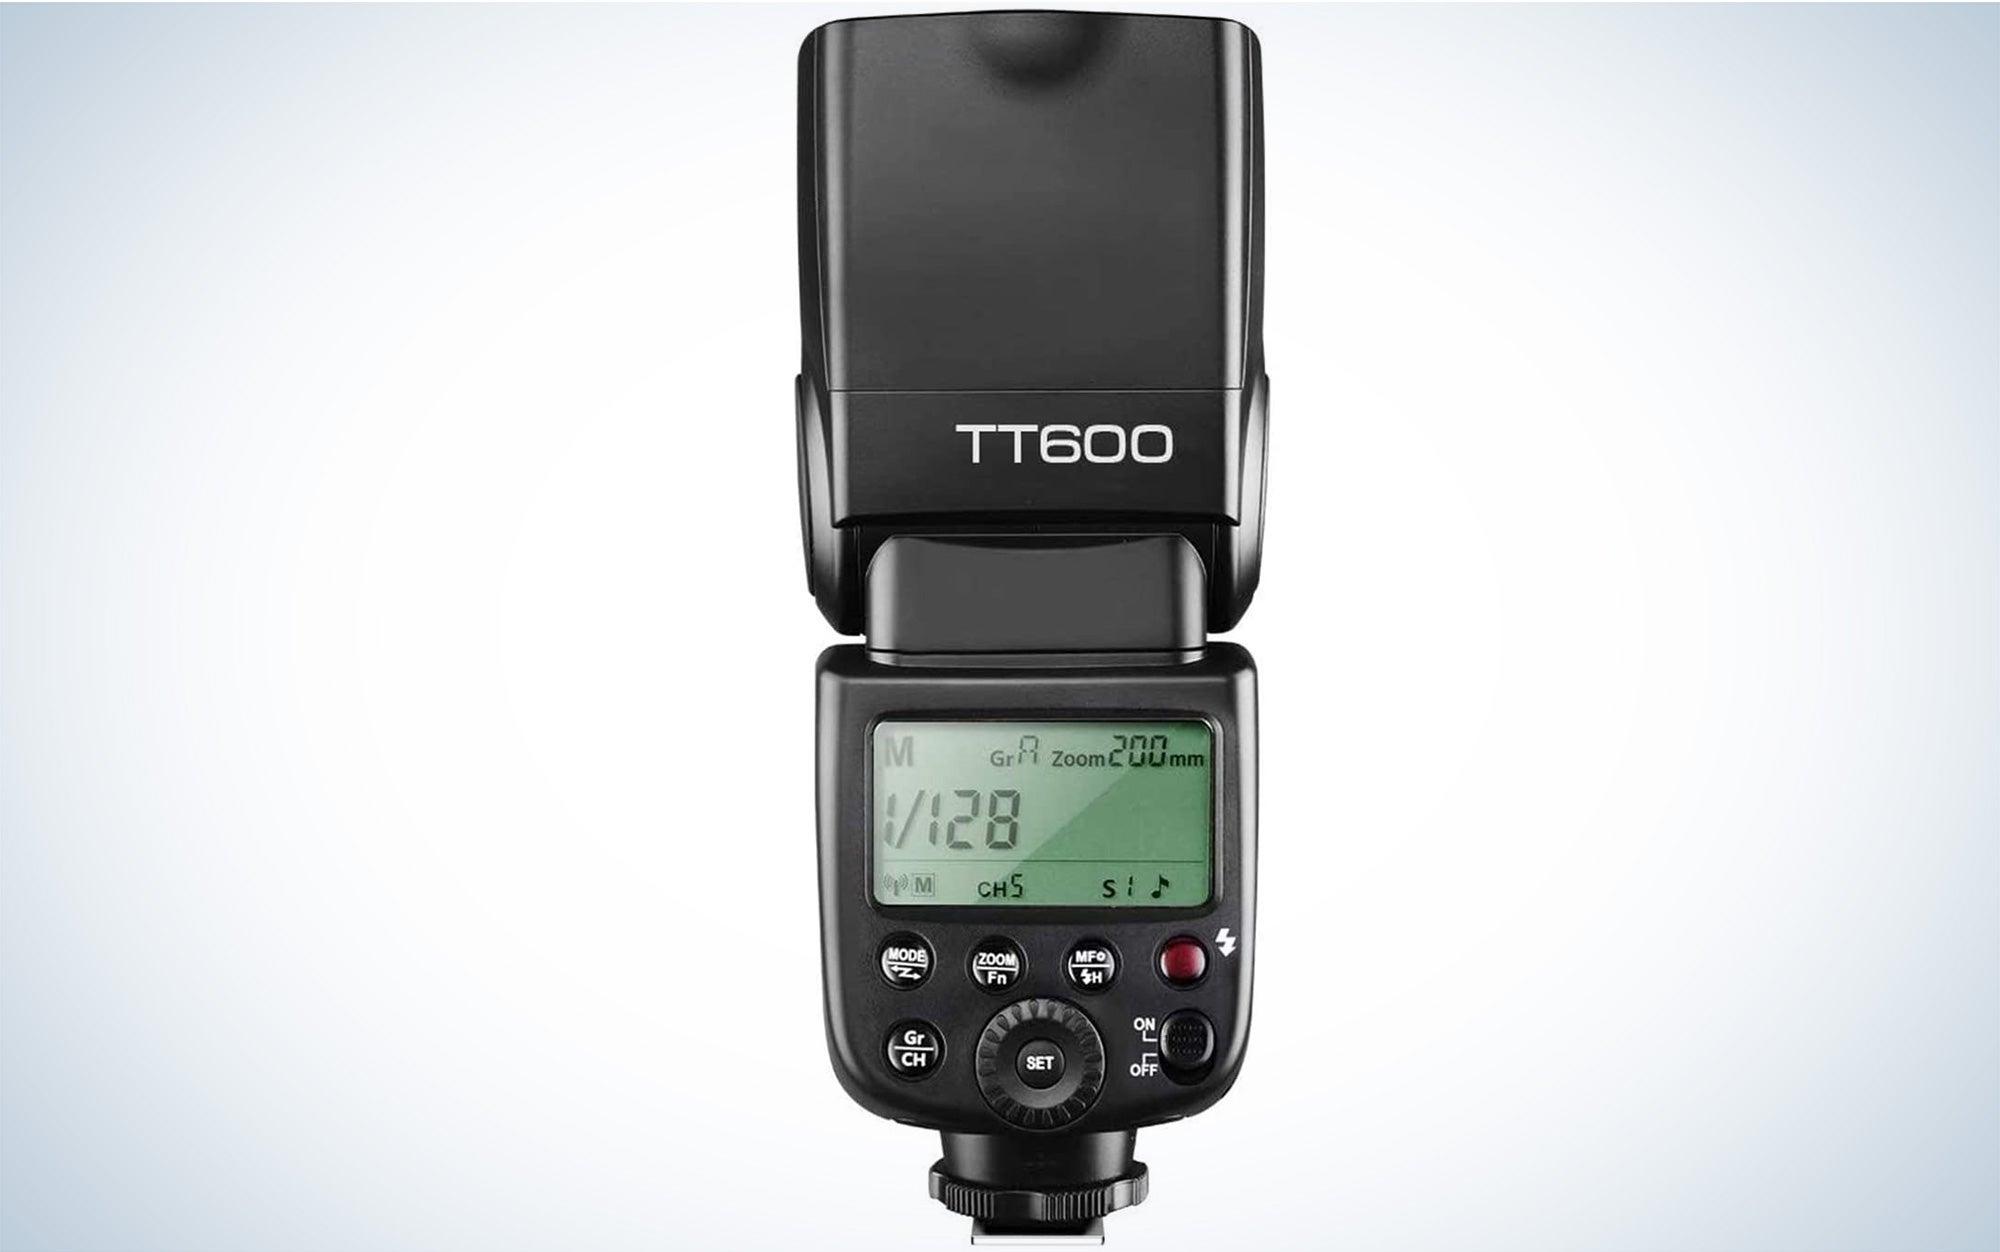 Godox TT600 Detachable Camera Flash